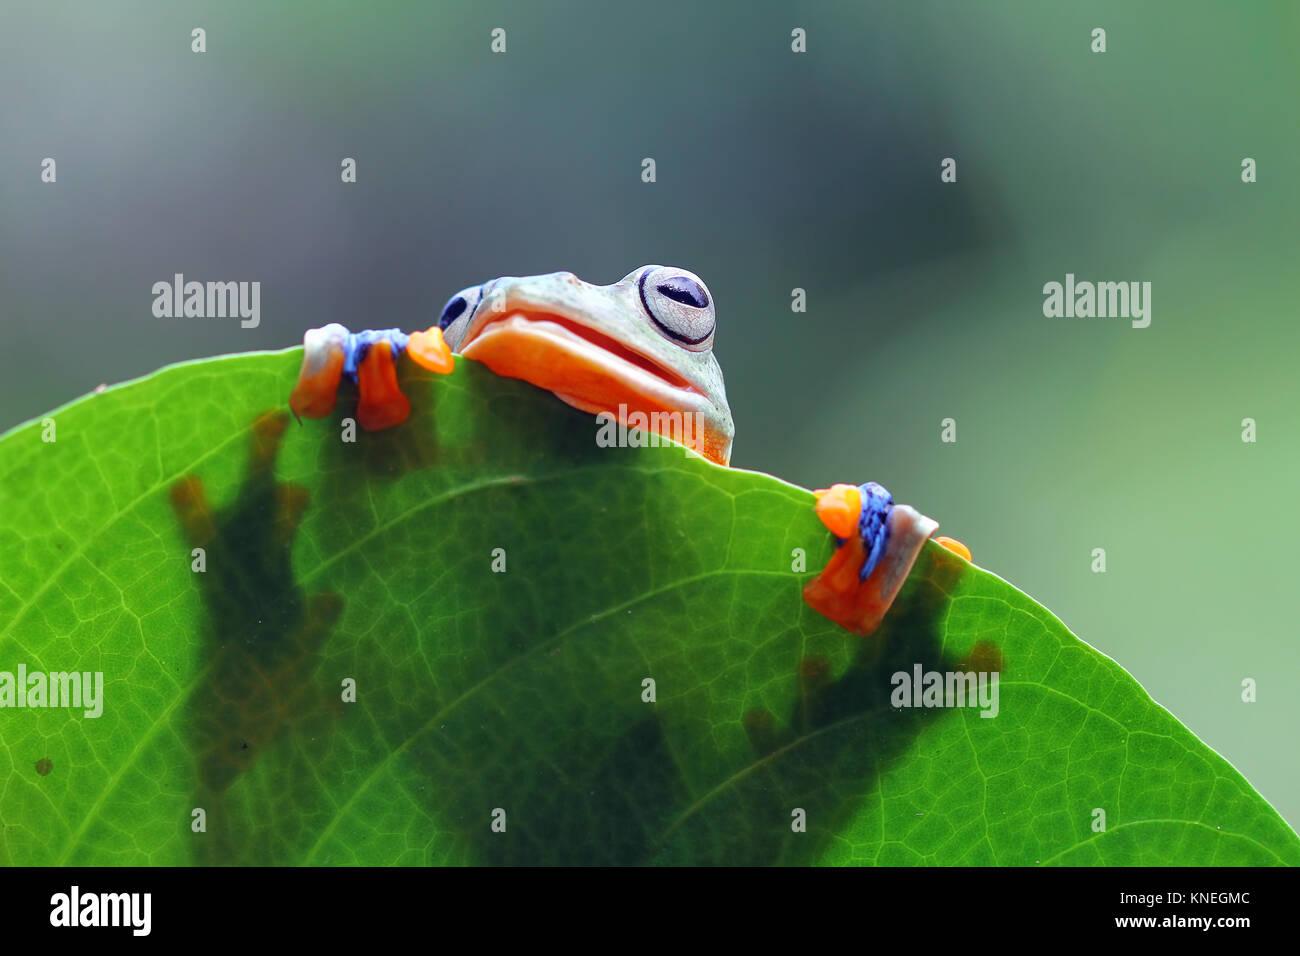 Tree frog (Rhacophorus reinwardtii) on a leaf - Stock Image